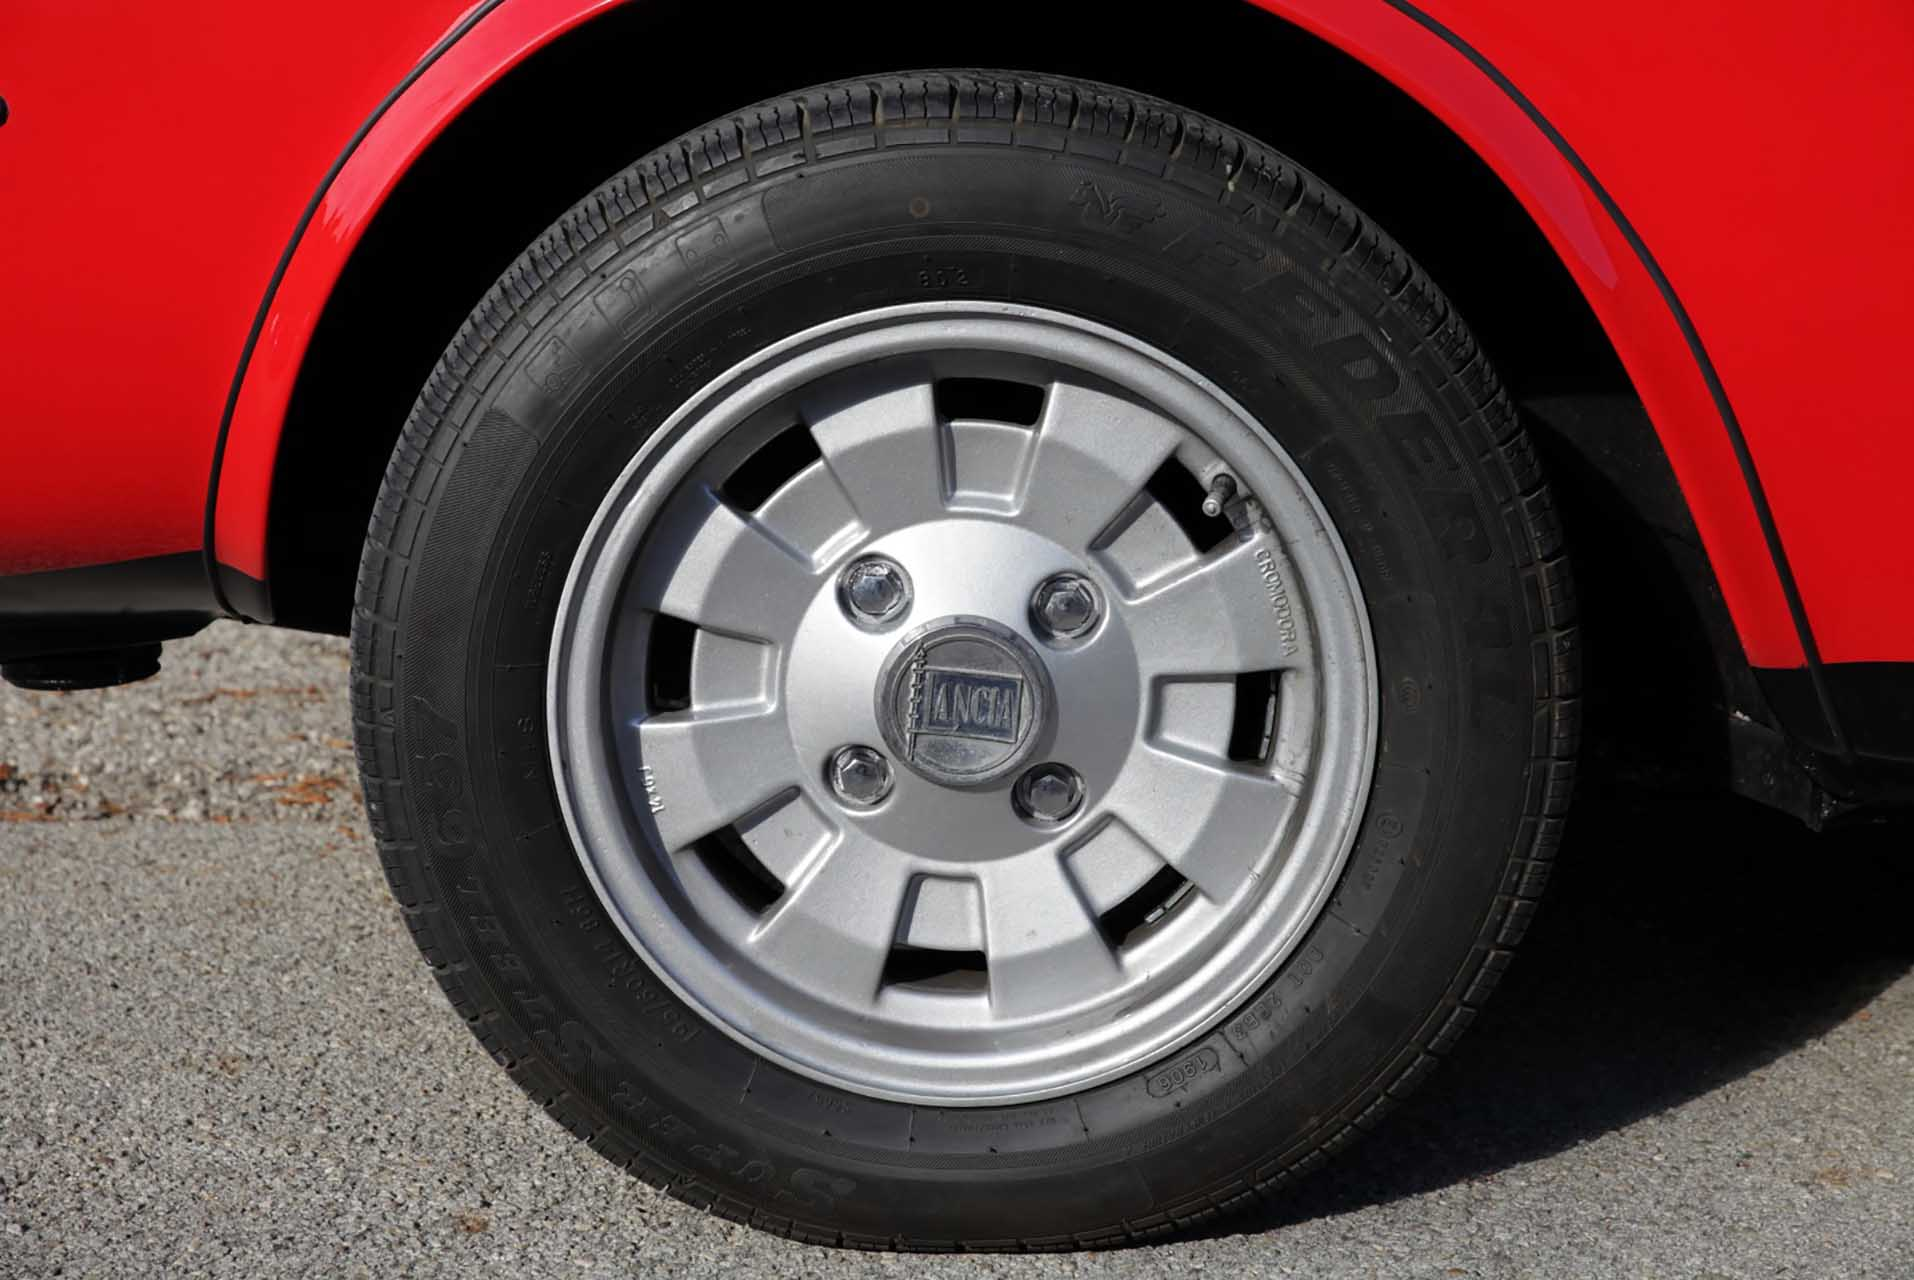 1972 Lancia Fulvia Montecarlo Rossa Corsa